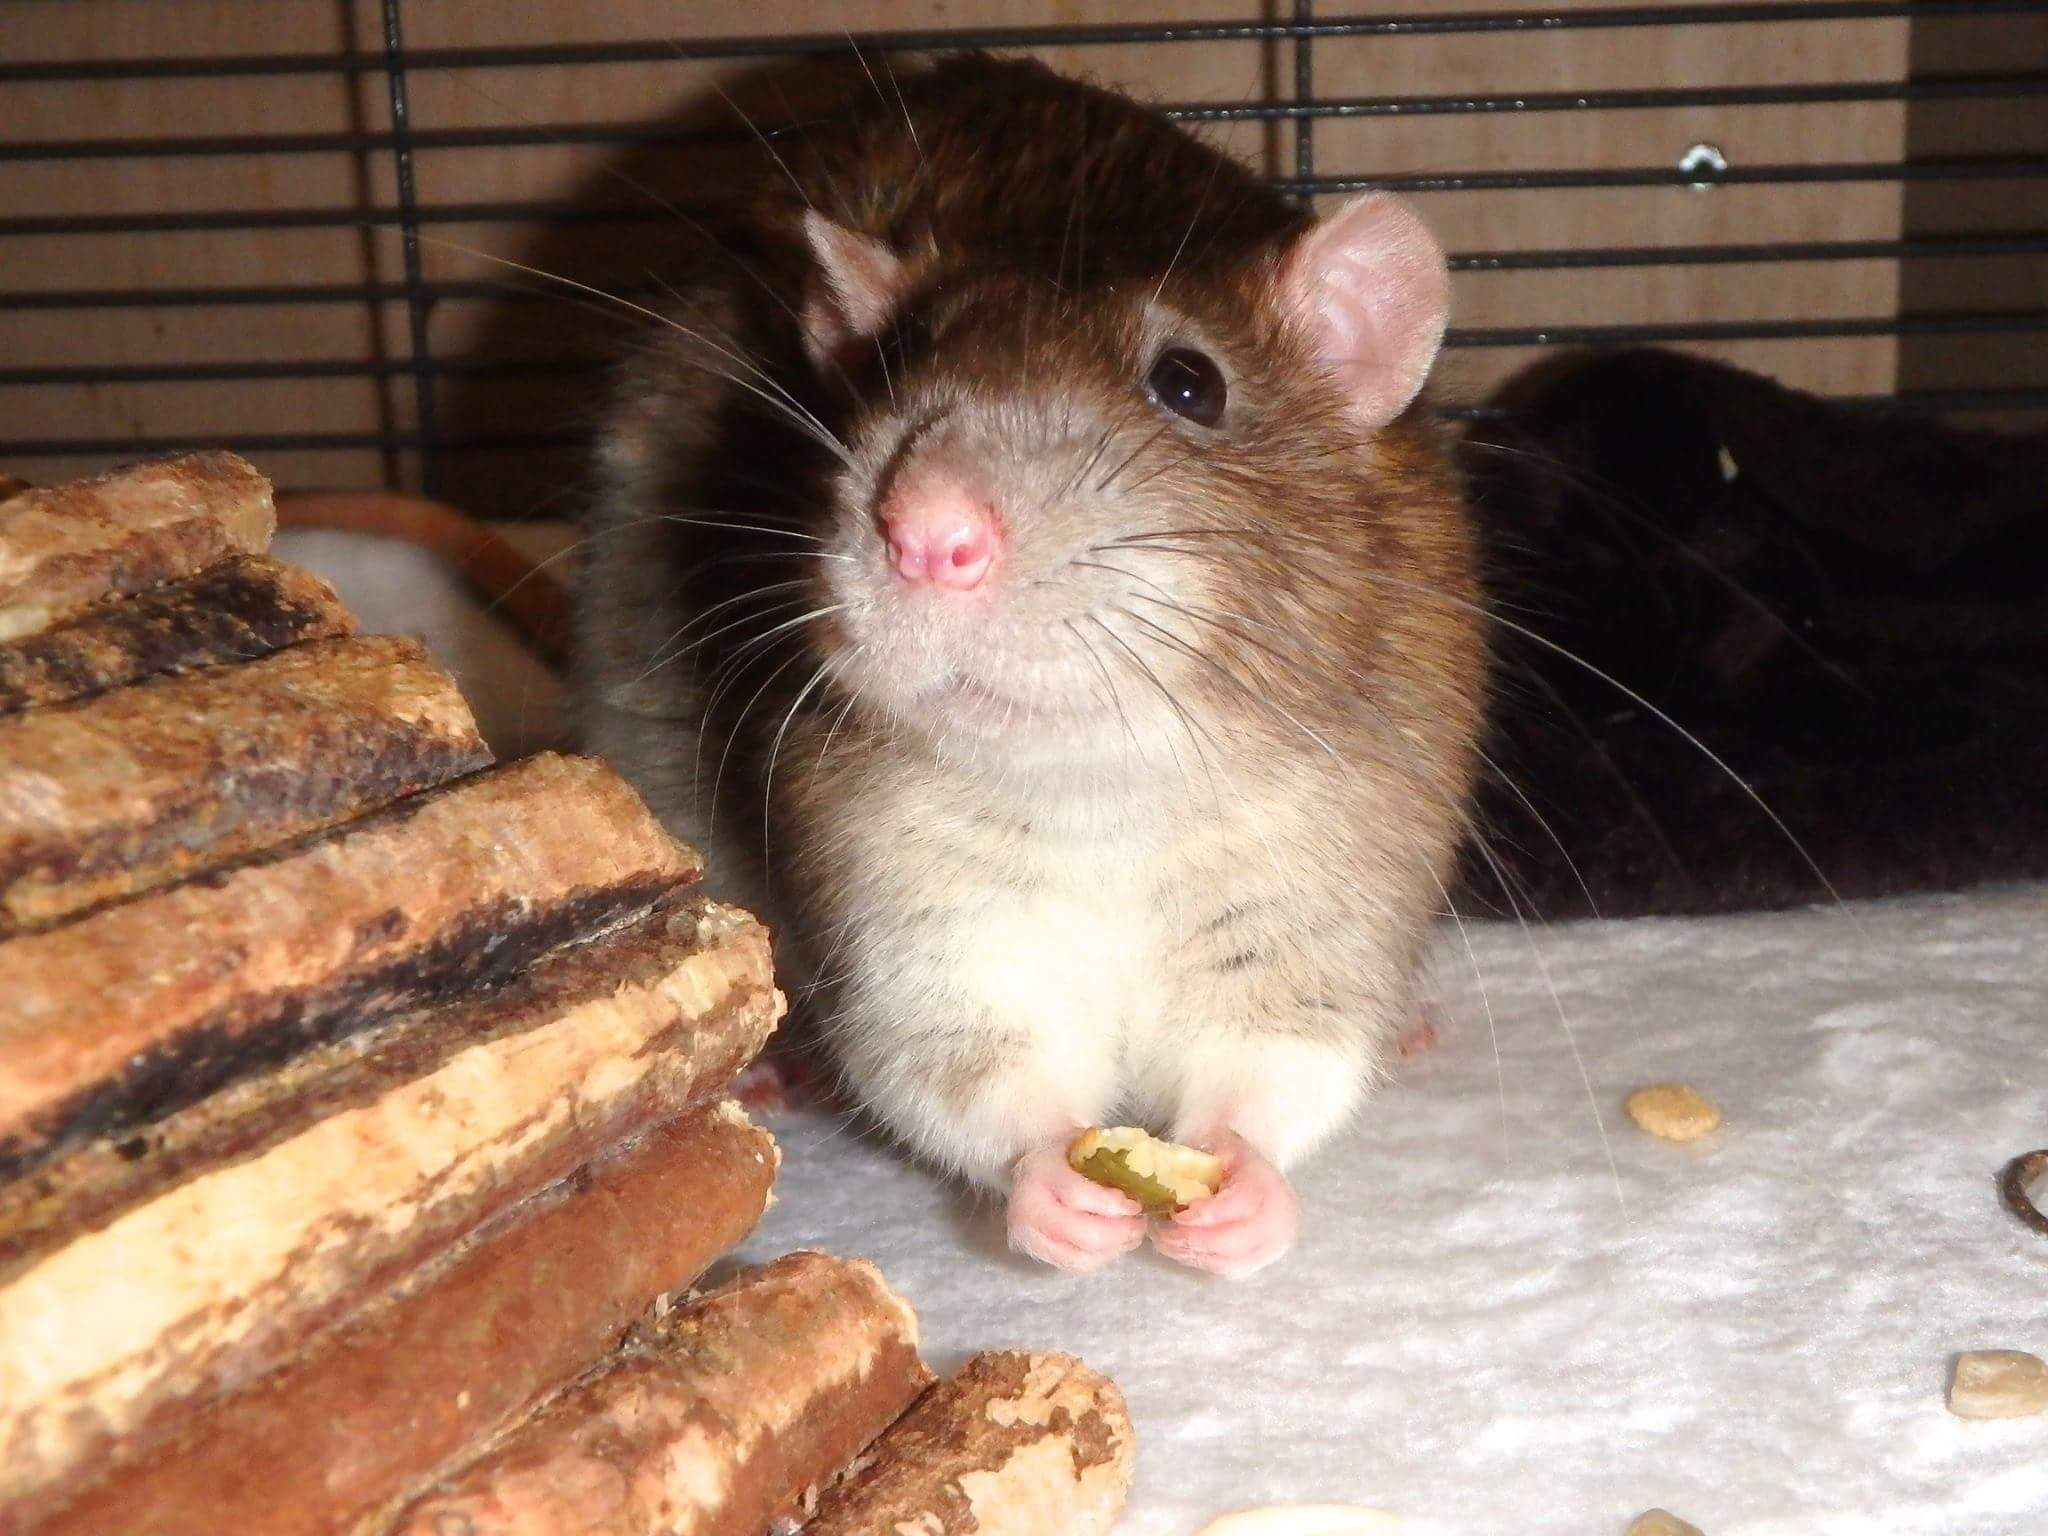 Standard rat - standard fur, top ears